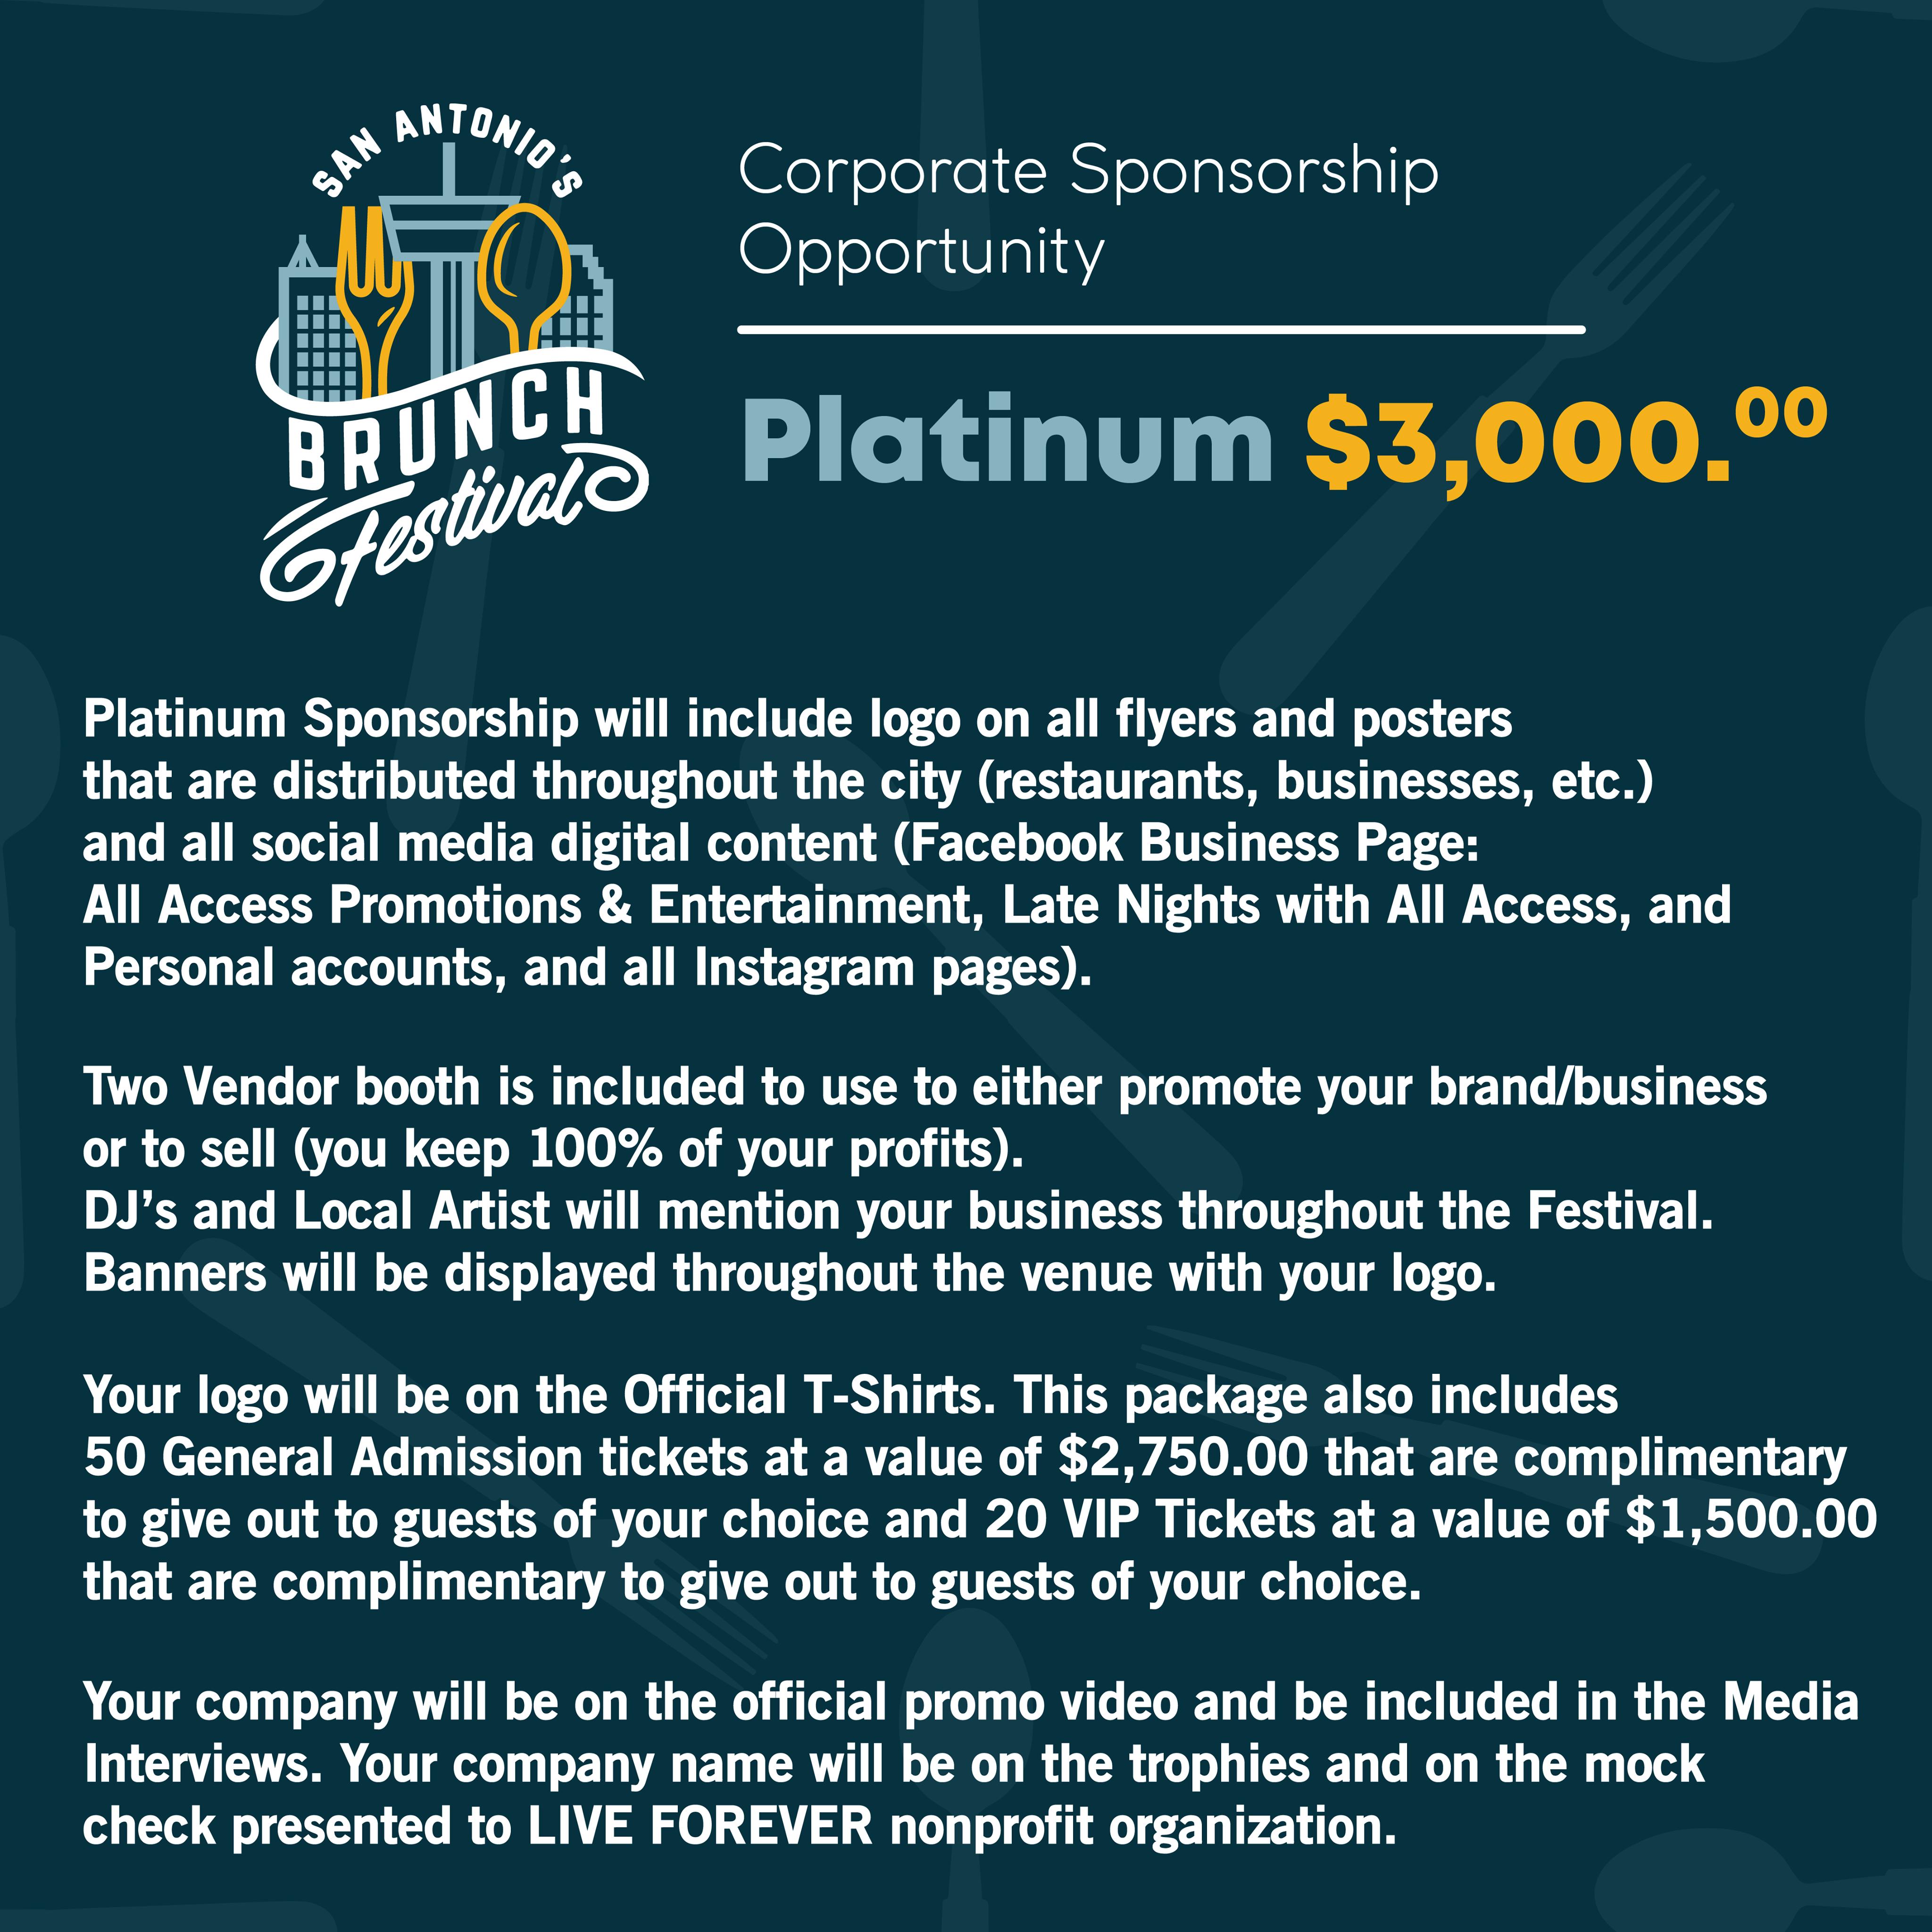 Platinum Sponsorship SA Brunch